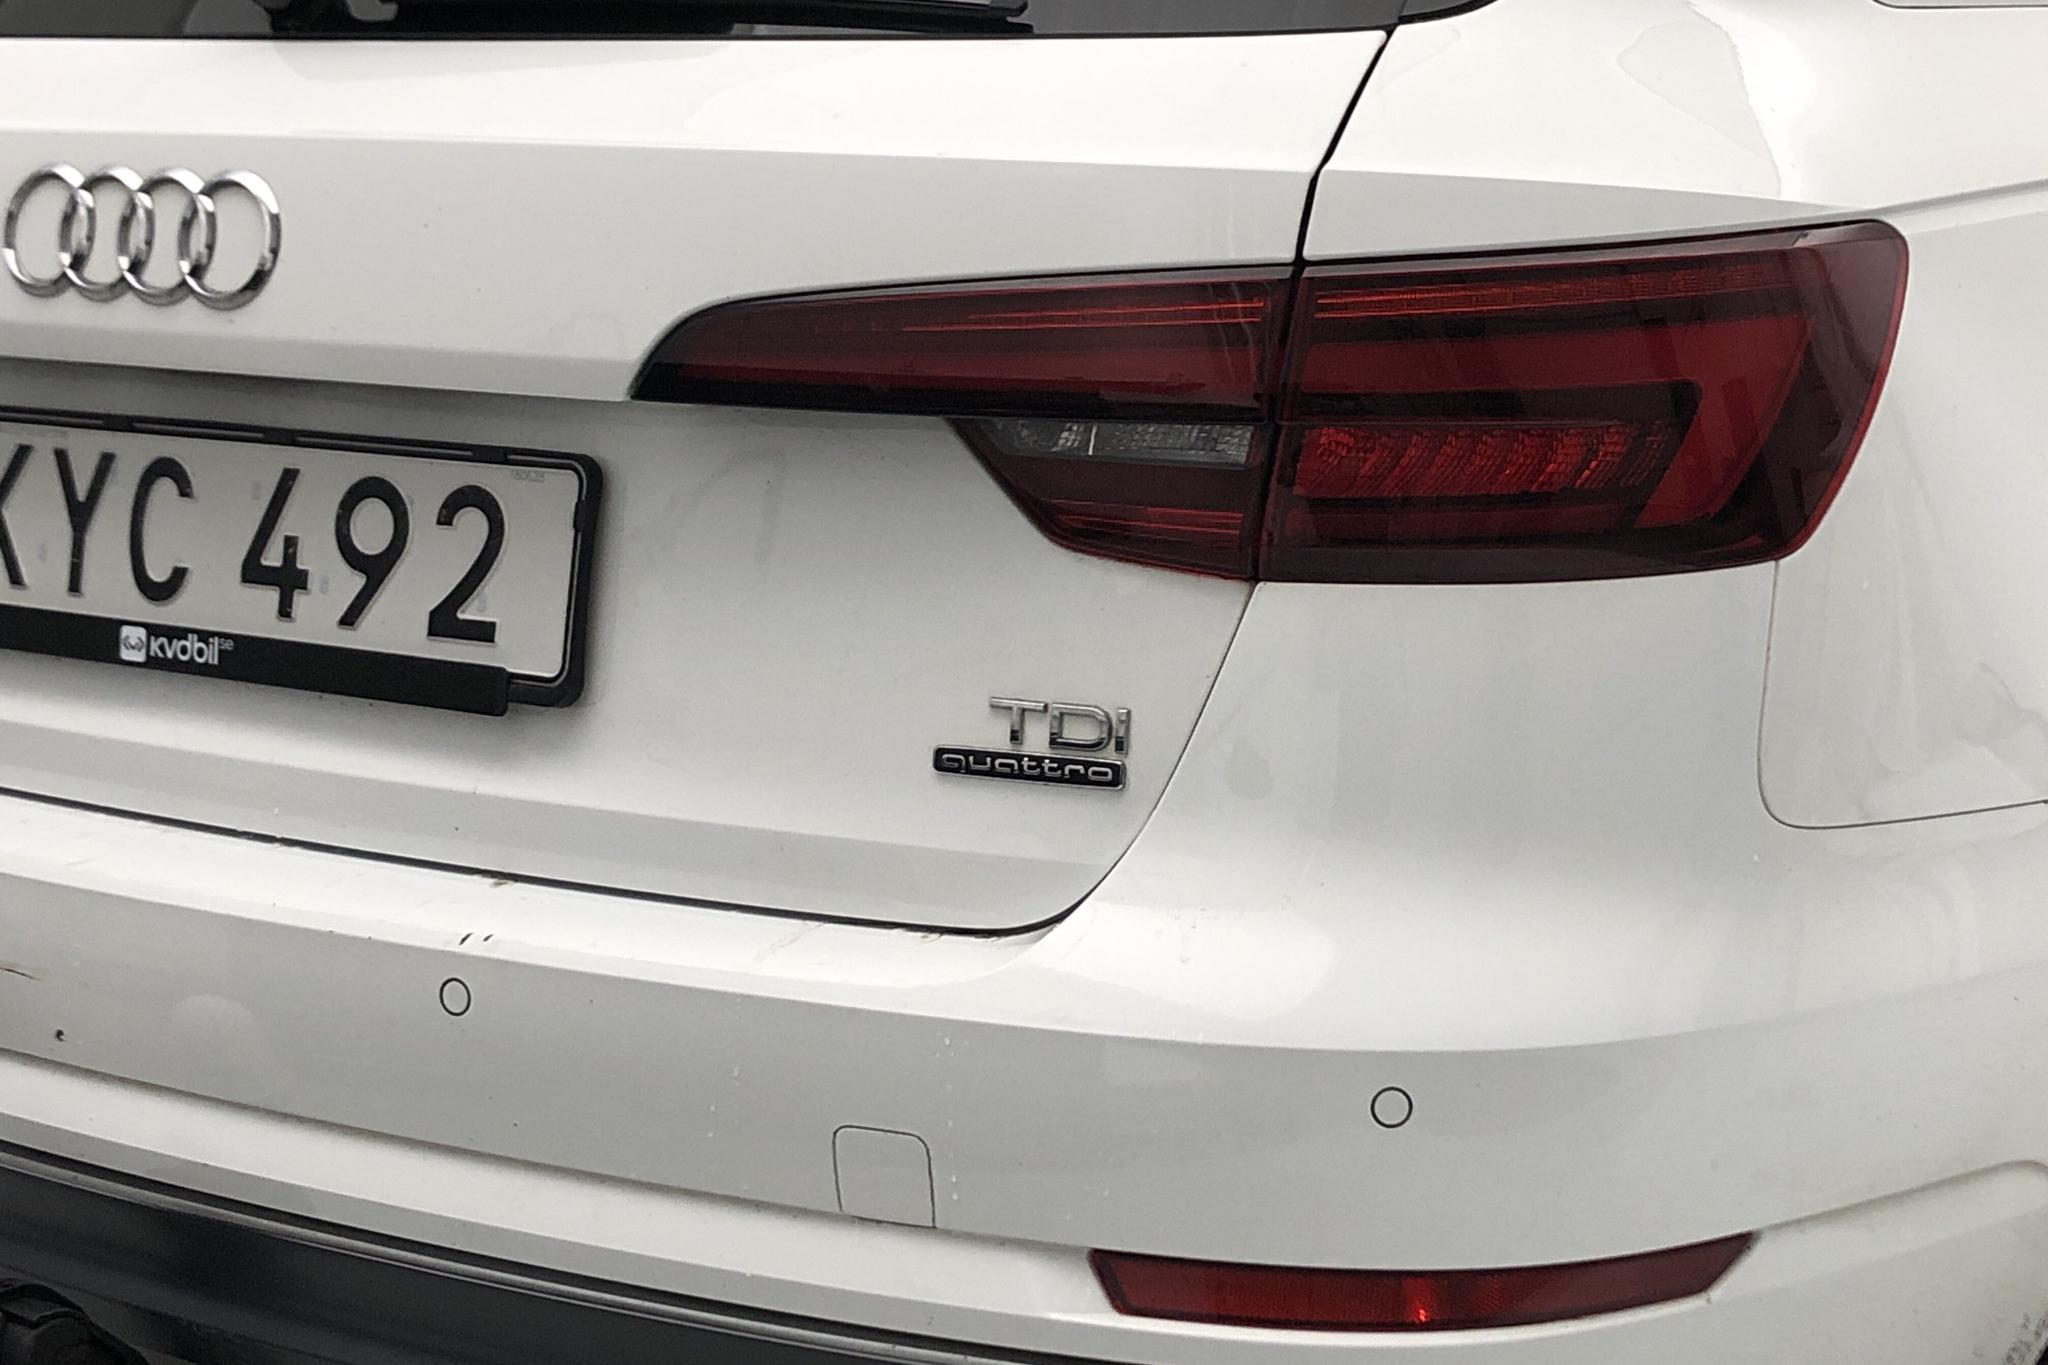 Audi A4 2.0 TDI Avant quattro (190hk) - 126 740 km - Automatic - white - 2018